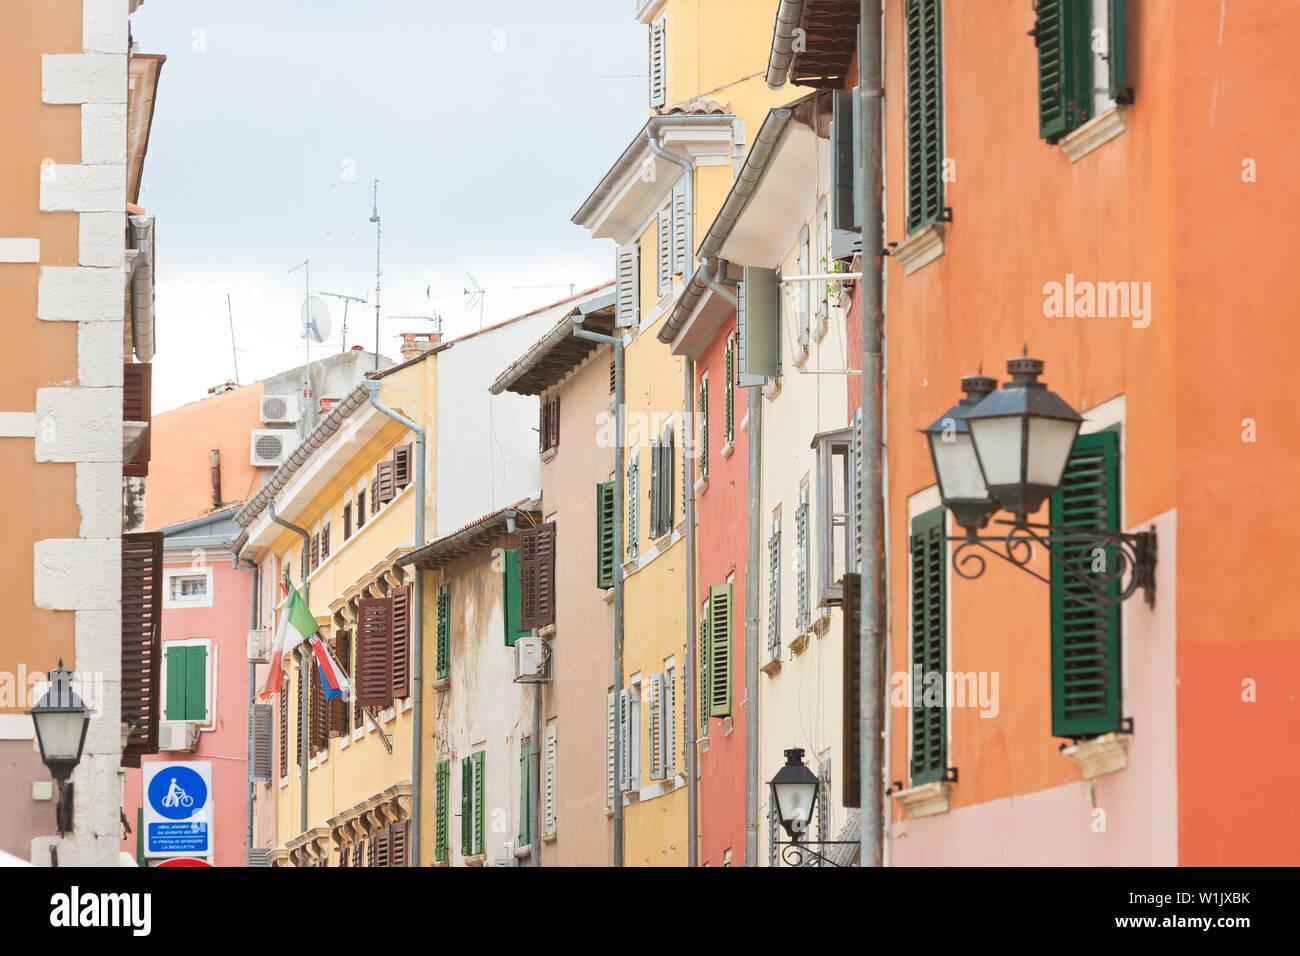 Rovinj, Istrien, Kroatien, Europa - Bunte Fassaden in den Gassen von Rovinj Stockfoto